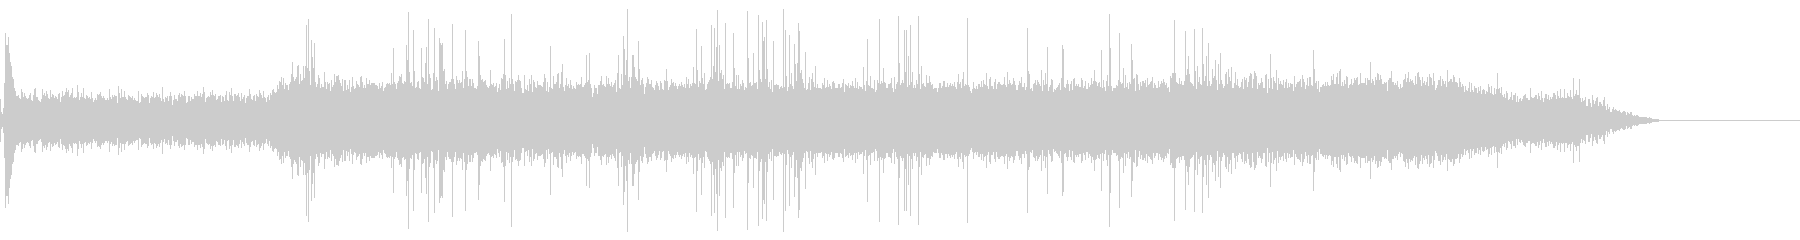 旋盤-現代-原理-制御-停止1の未再生の波形